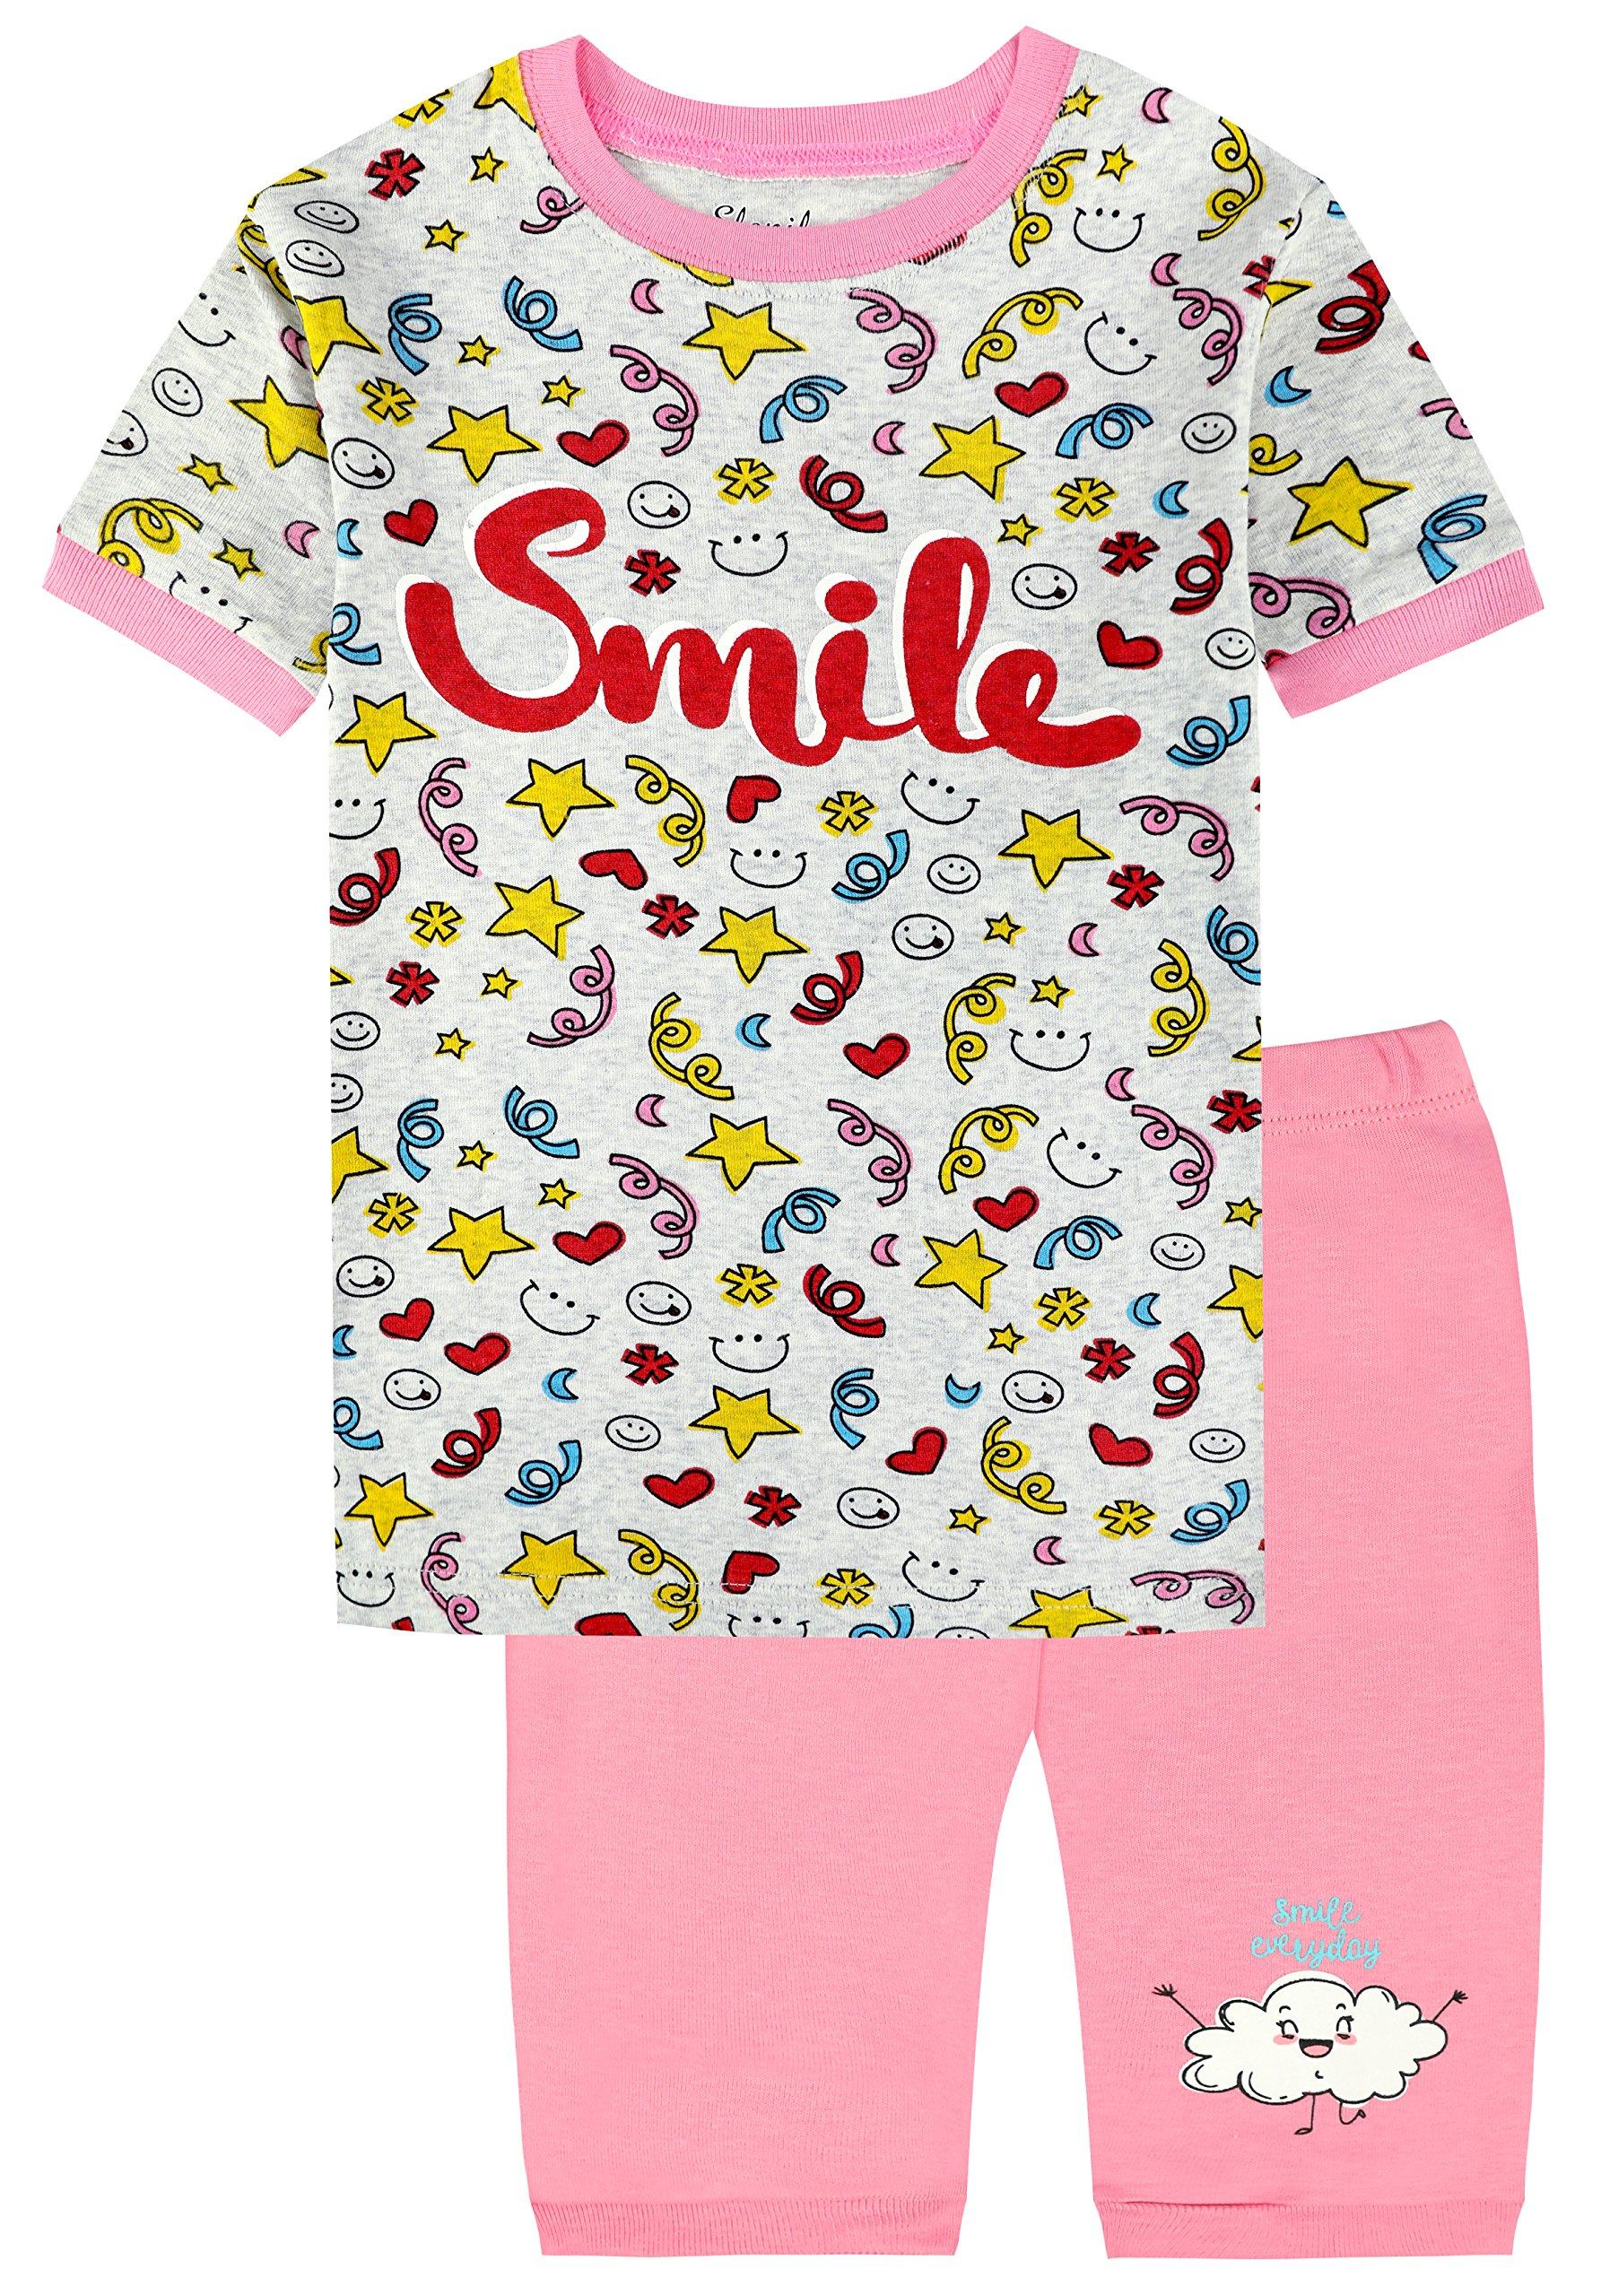 Slenily Girls Short Pajamas Toddler Kids Pjs 100% Cotton Sleepwear Summer Clothes Shirts Size 10